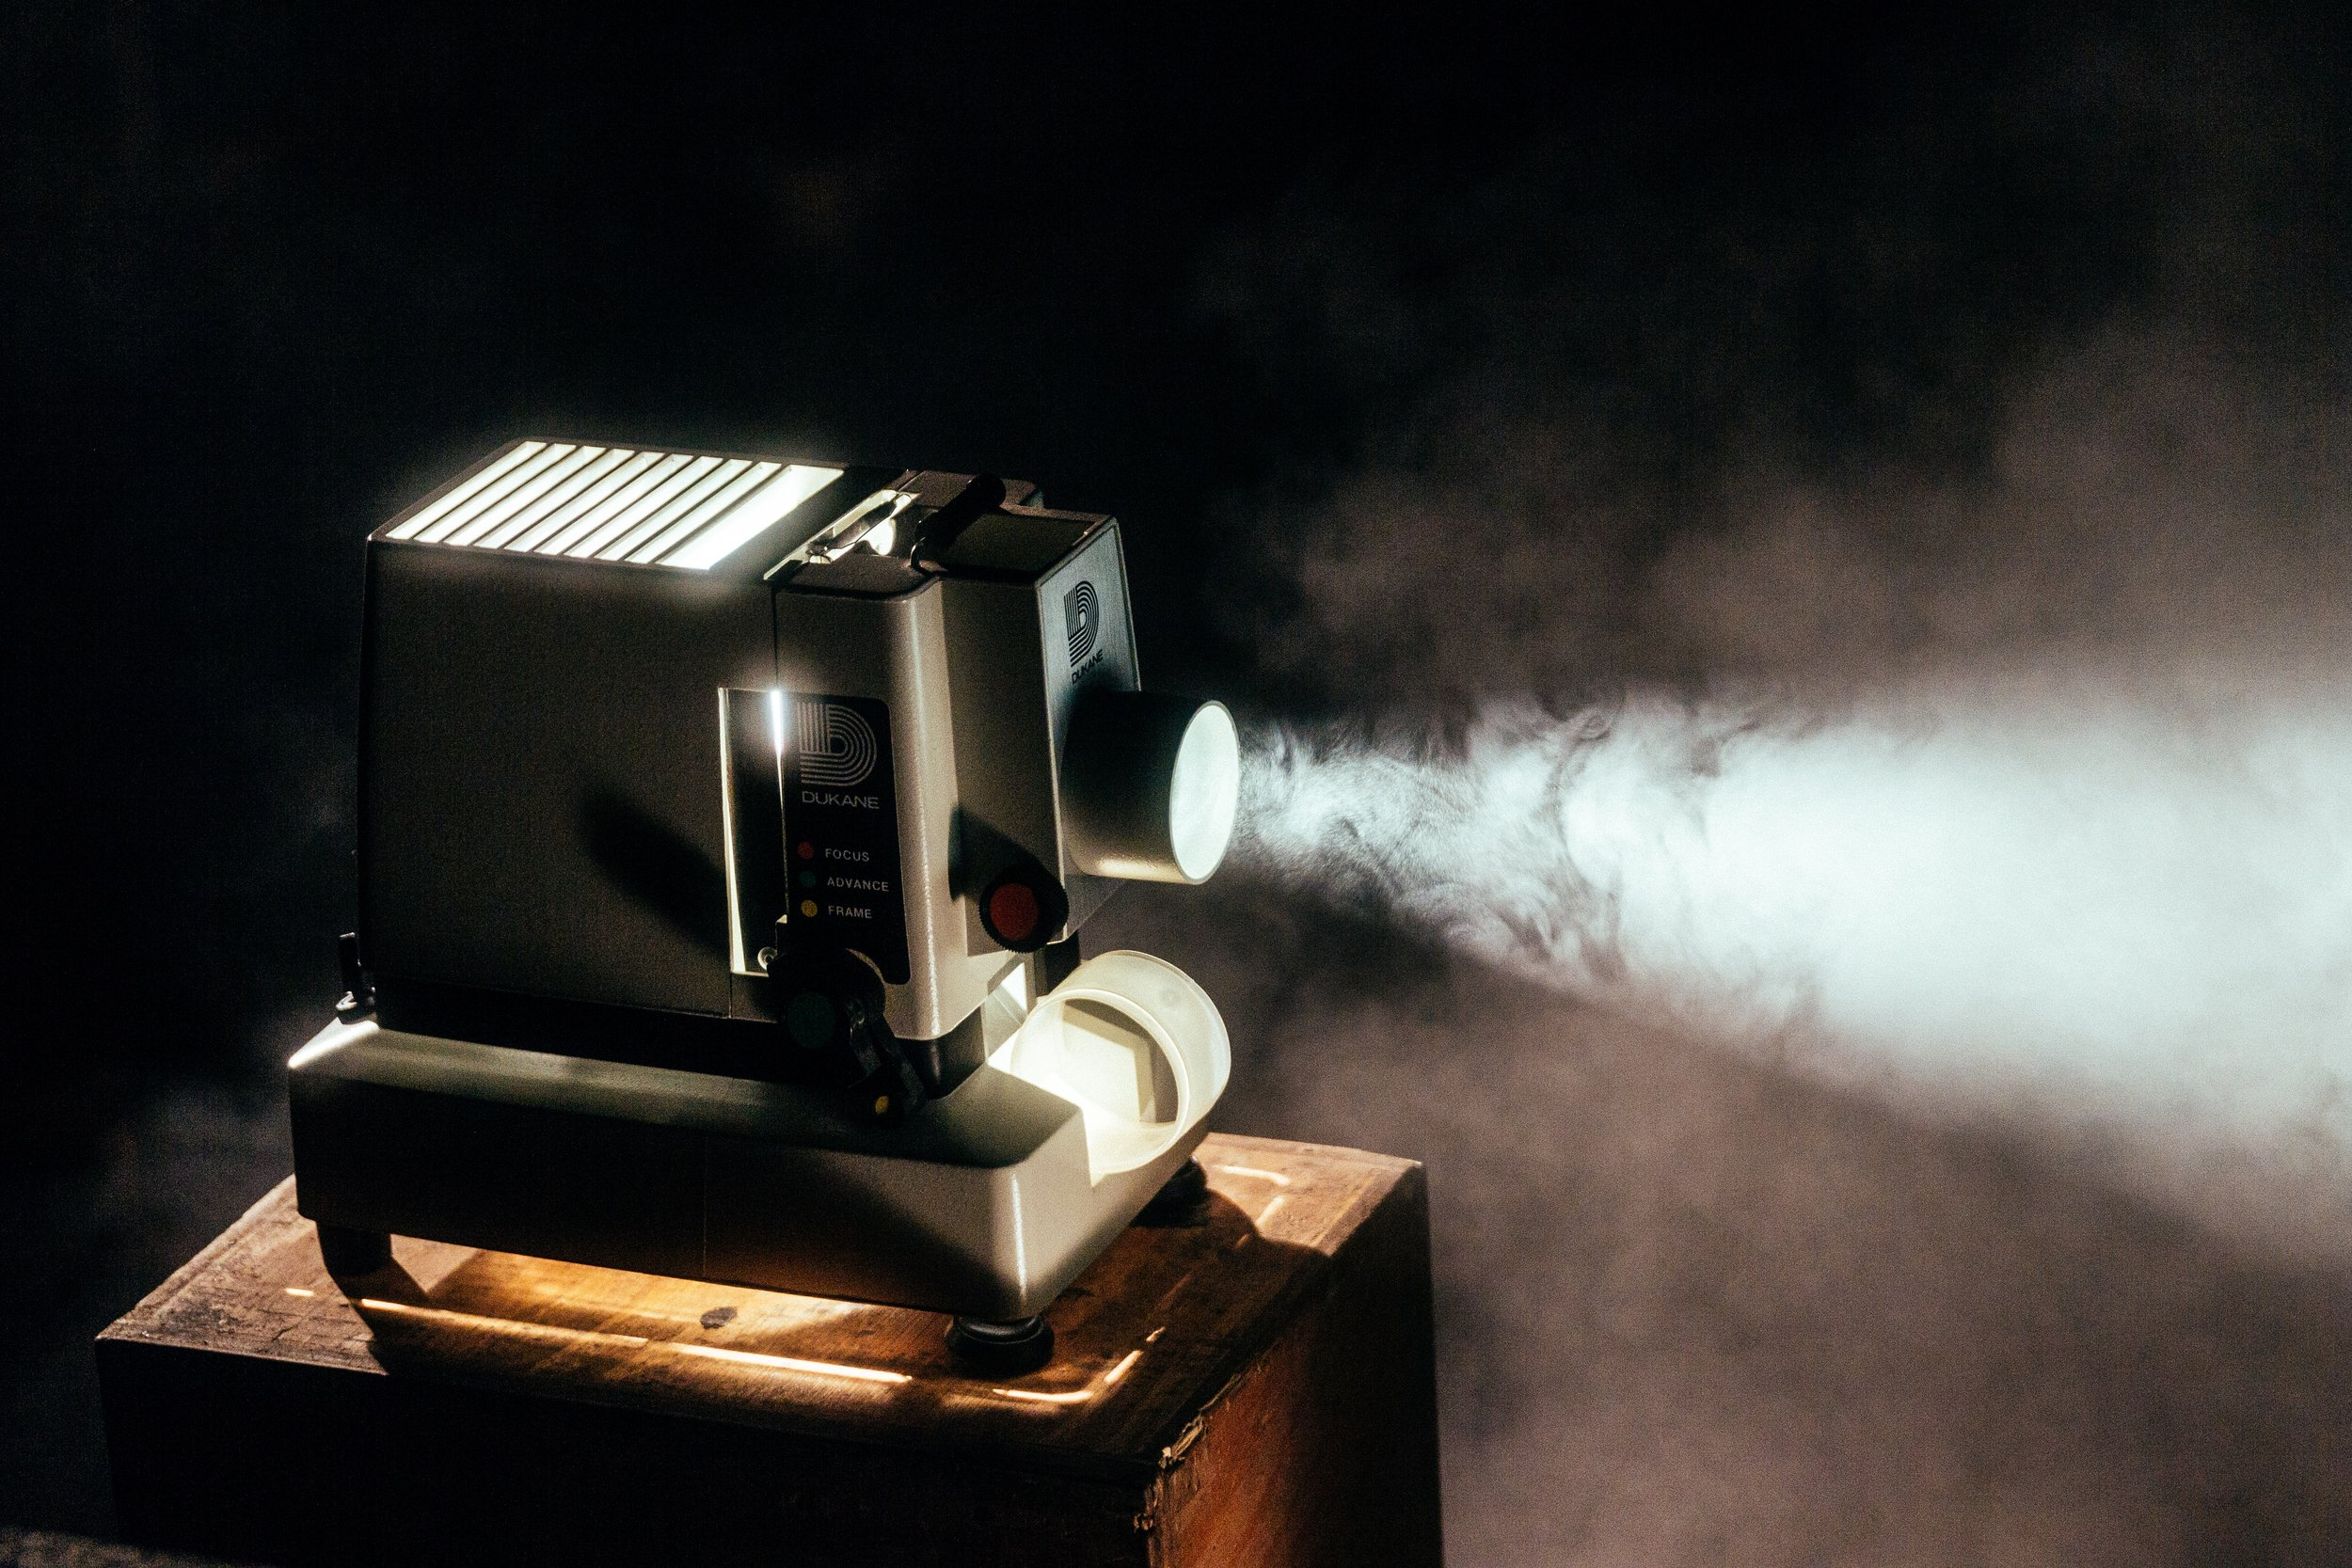 light-mist-vintage-retro-drink-darkness-89840-pxhere.com.jpg